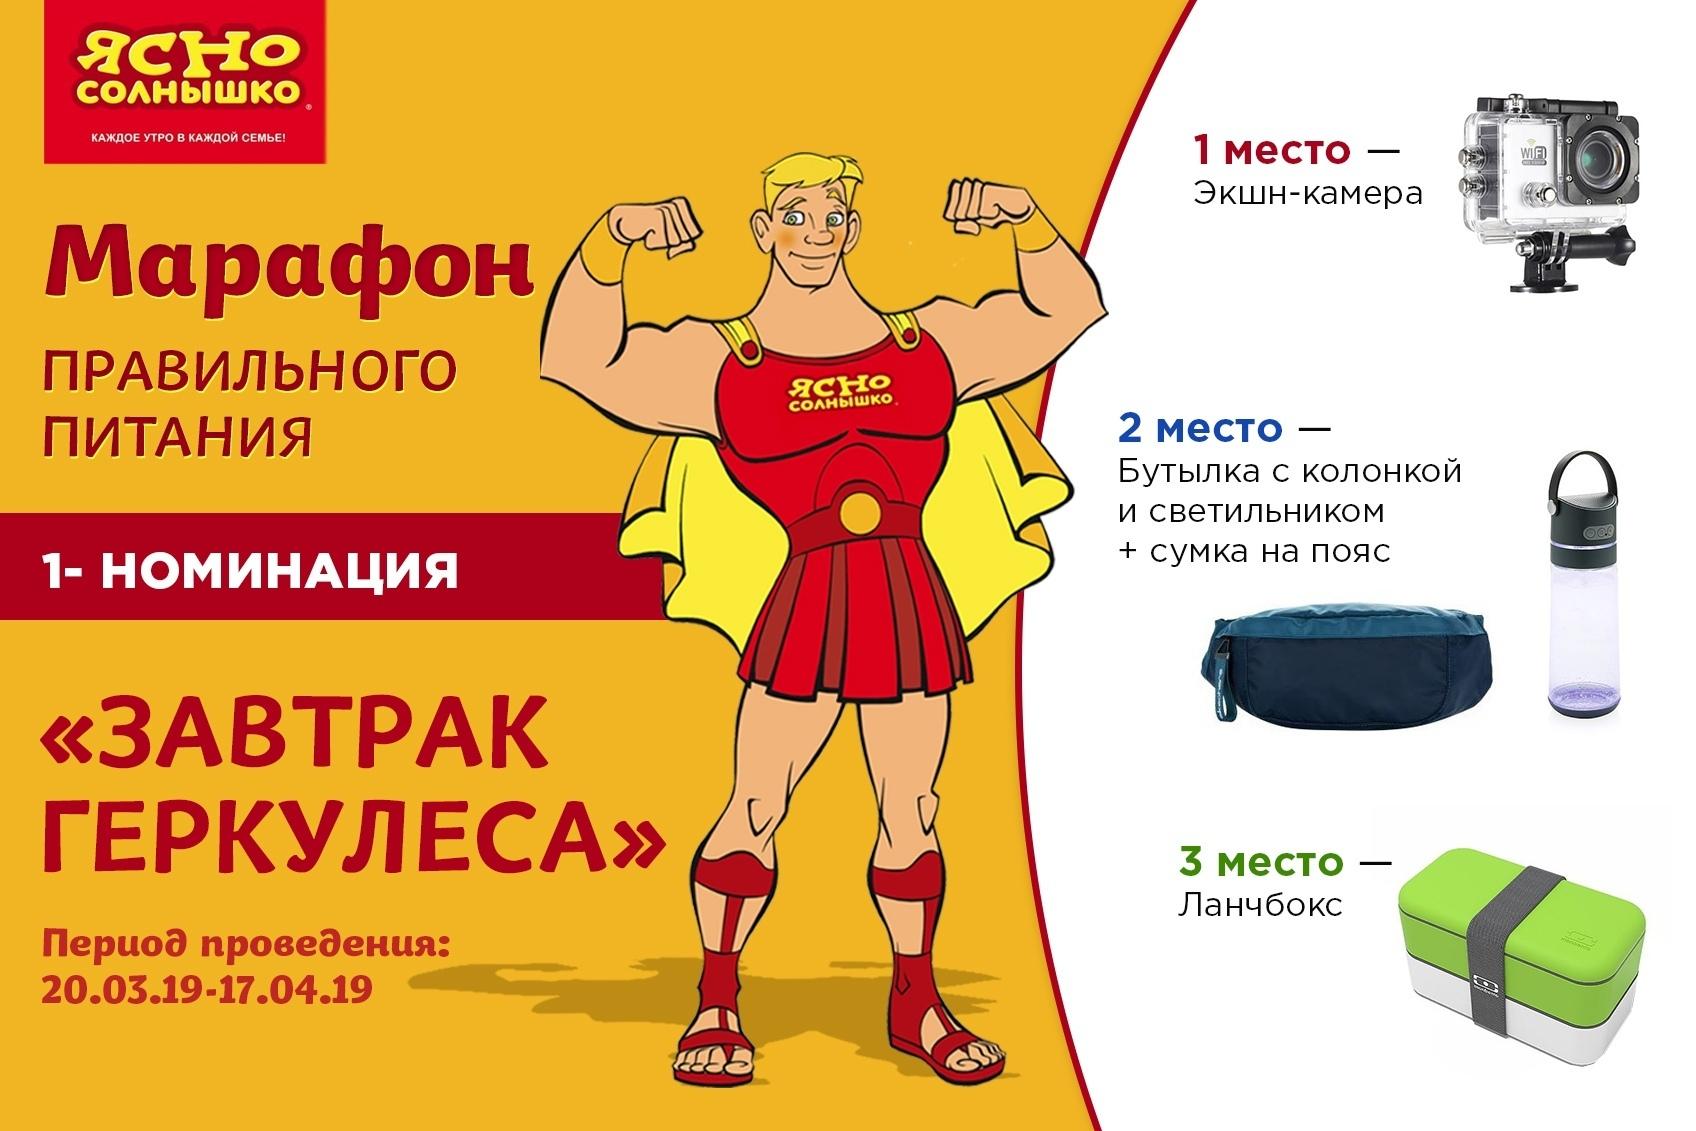 vk.com/yasno.solnishko регистрация промо кода в 2019 году